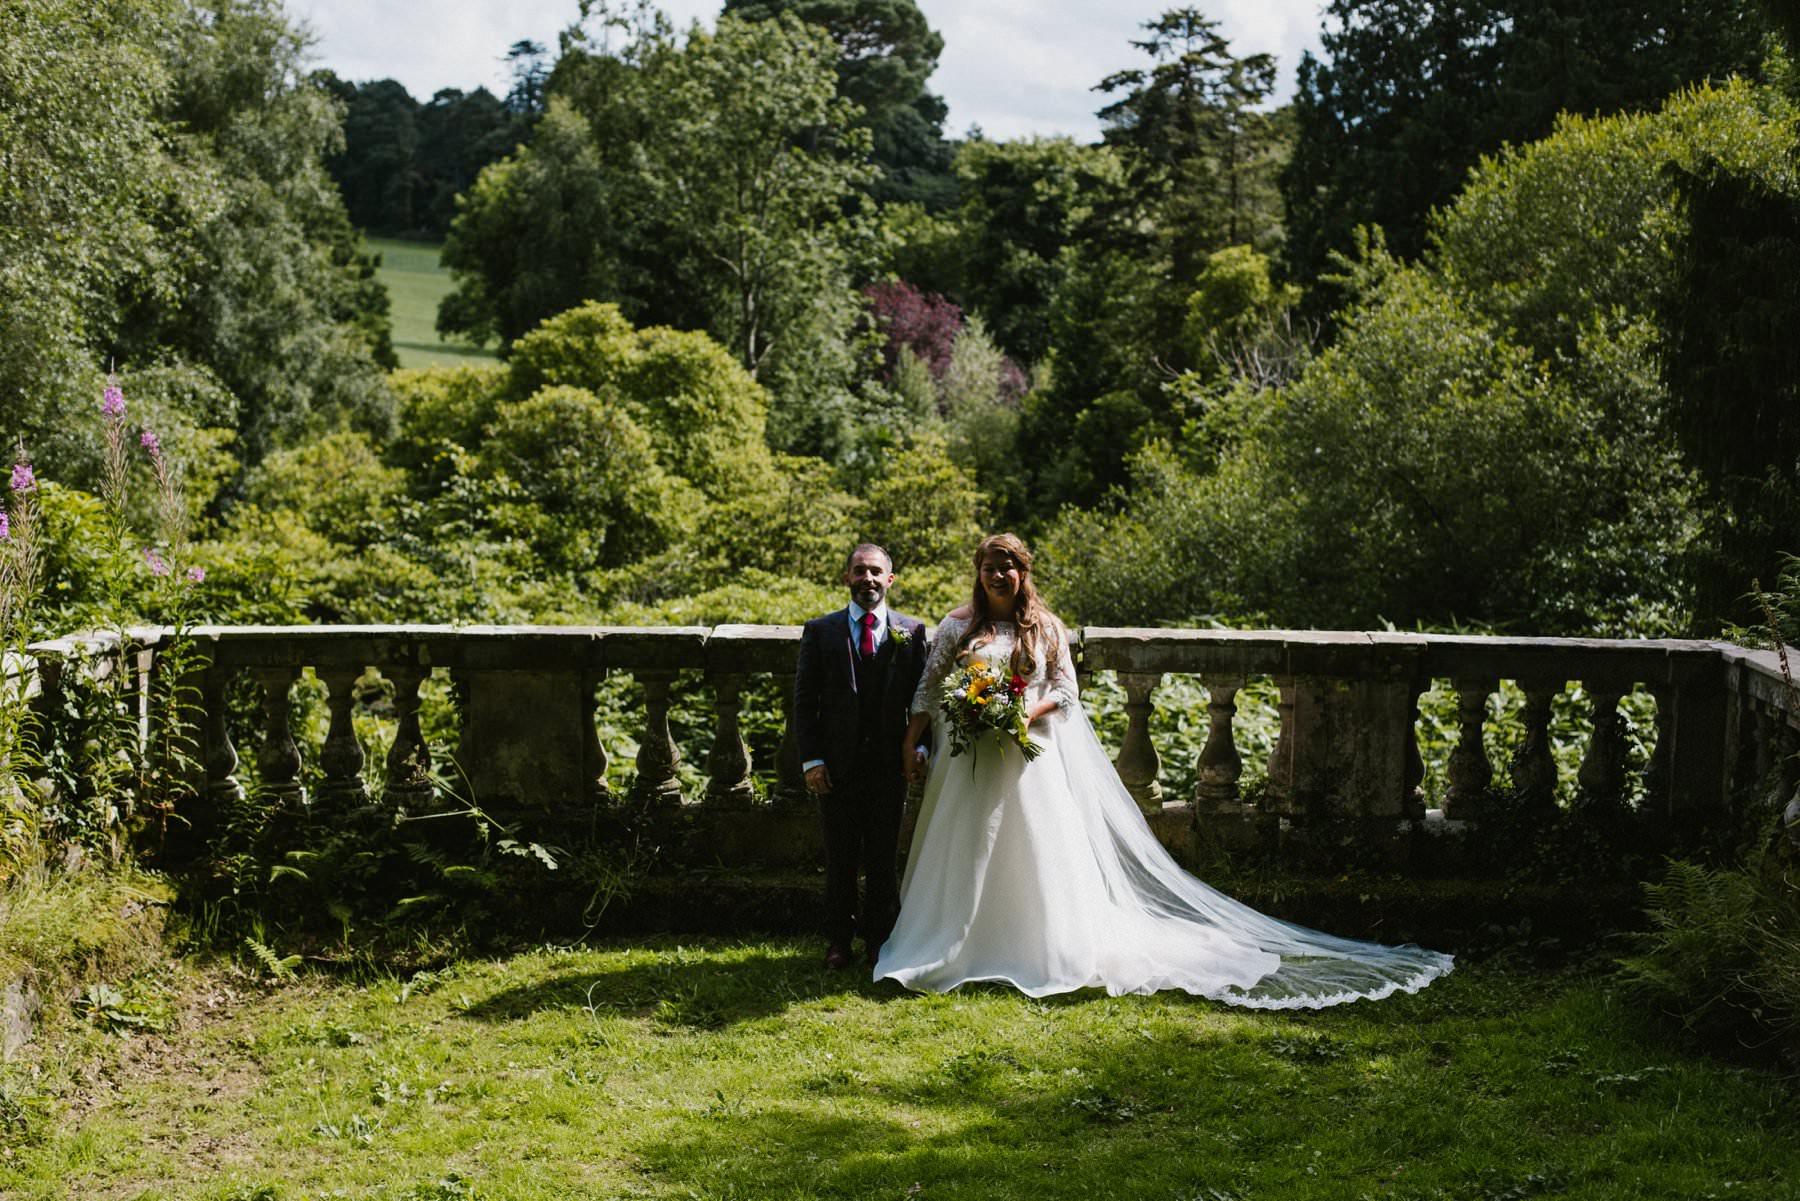 drenagh wedding photographer